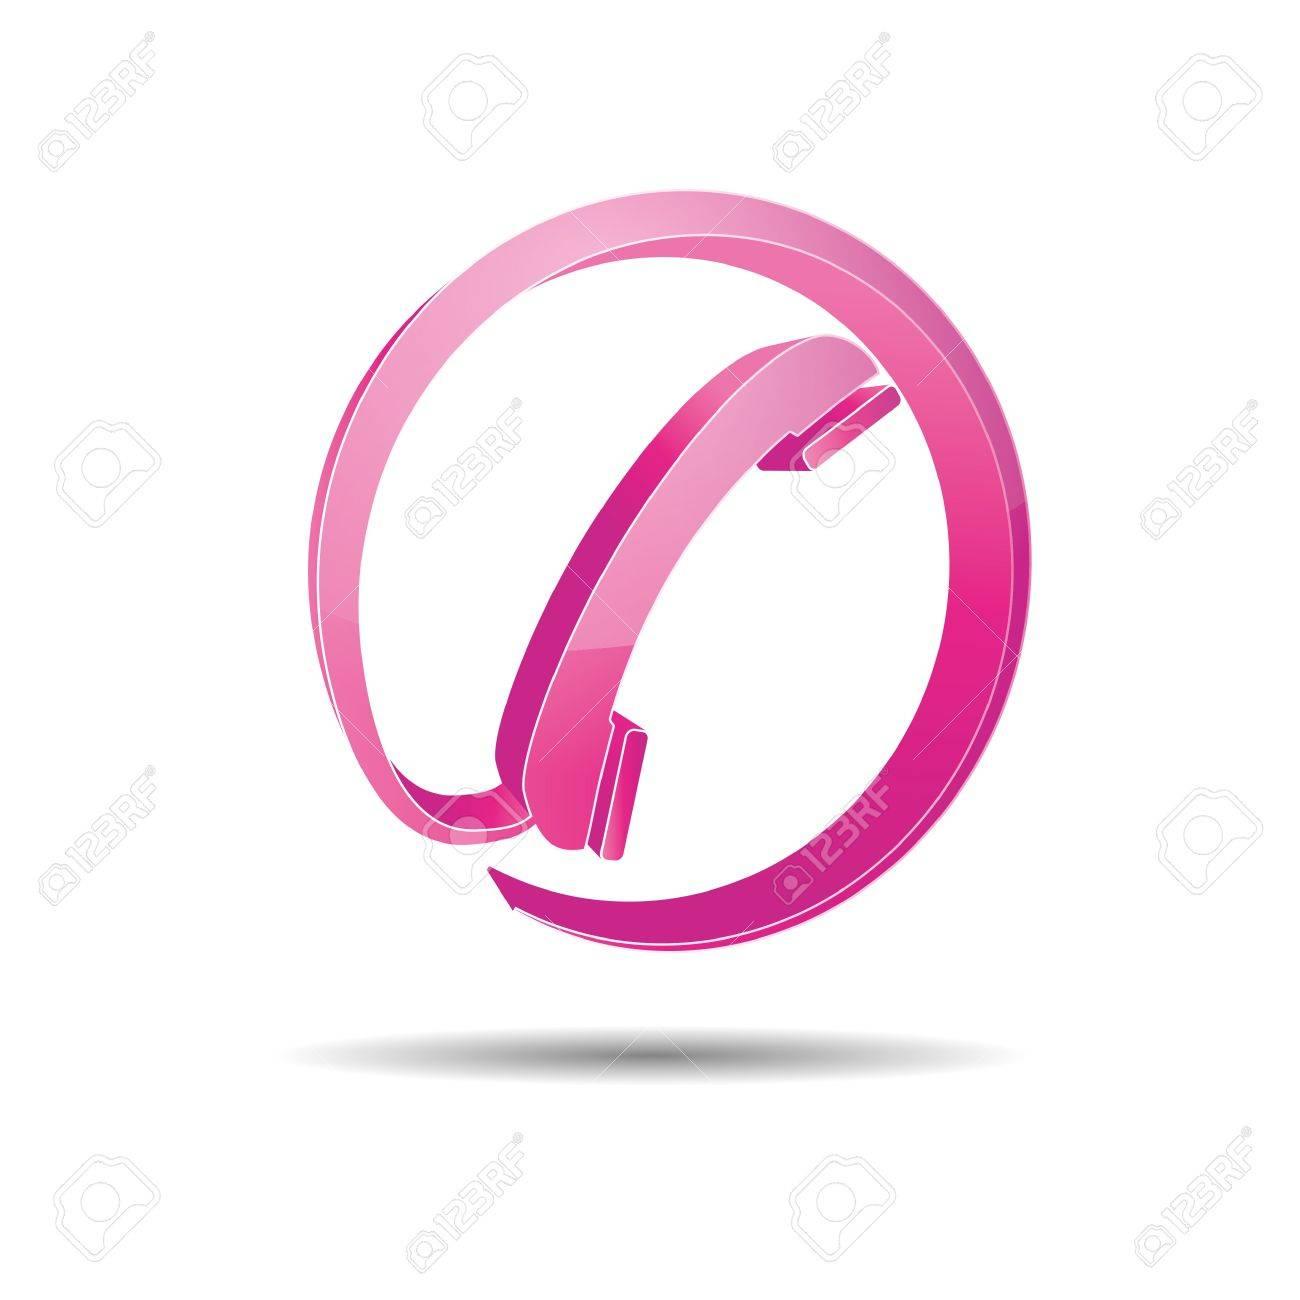 Contact circle phone hotline kontaktfomular callcenter call pictogram sign symbol telephone Stock Vector - 14757906